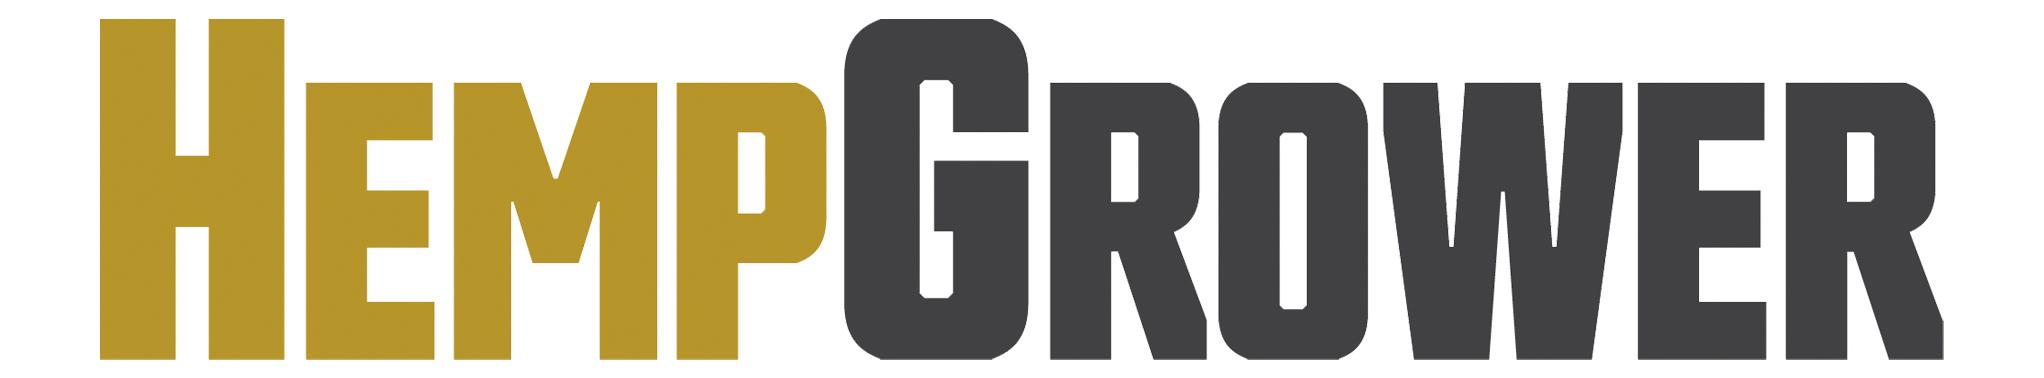 HempGrower logo